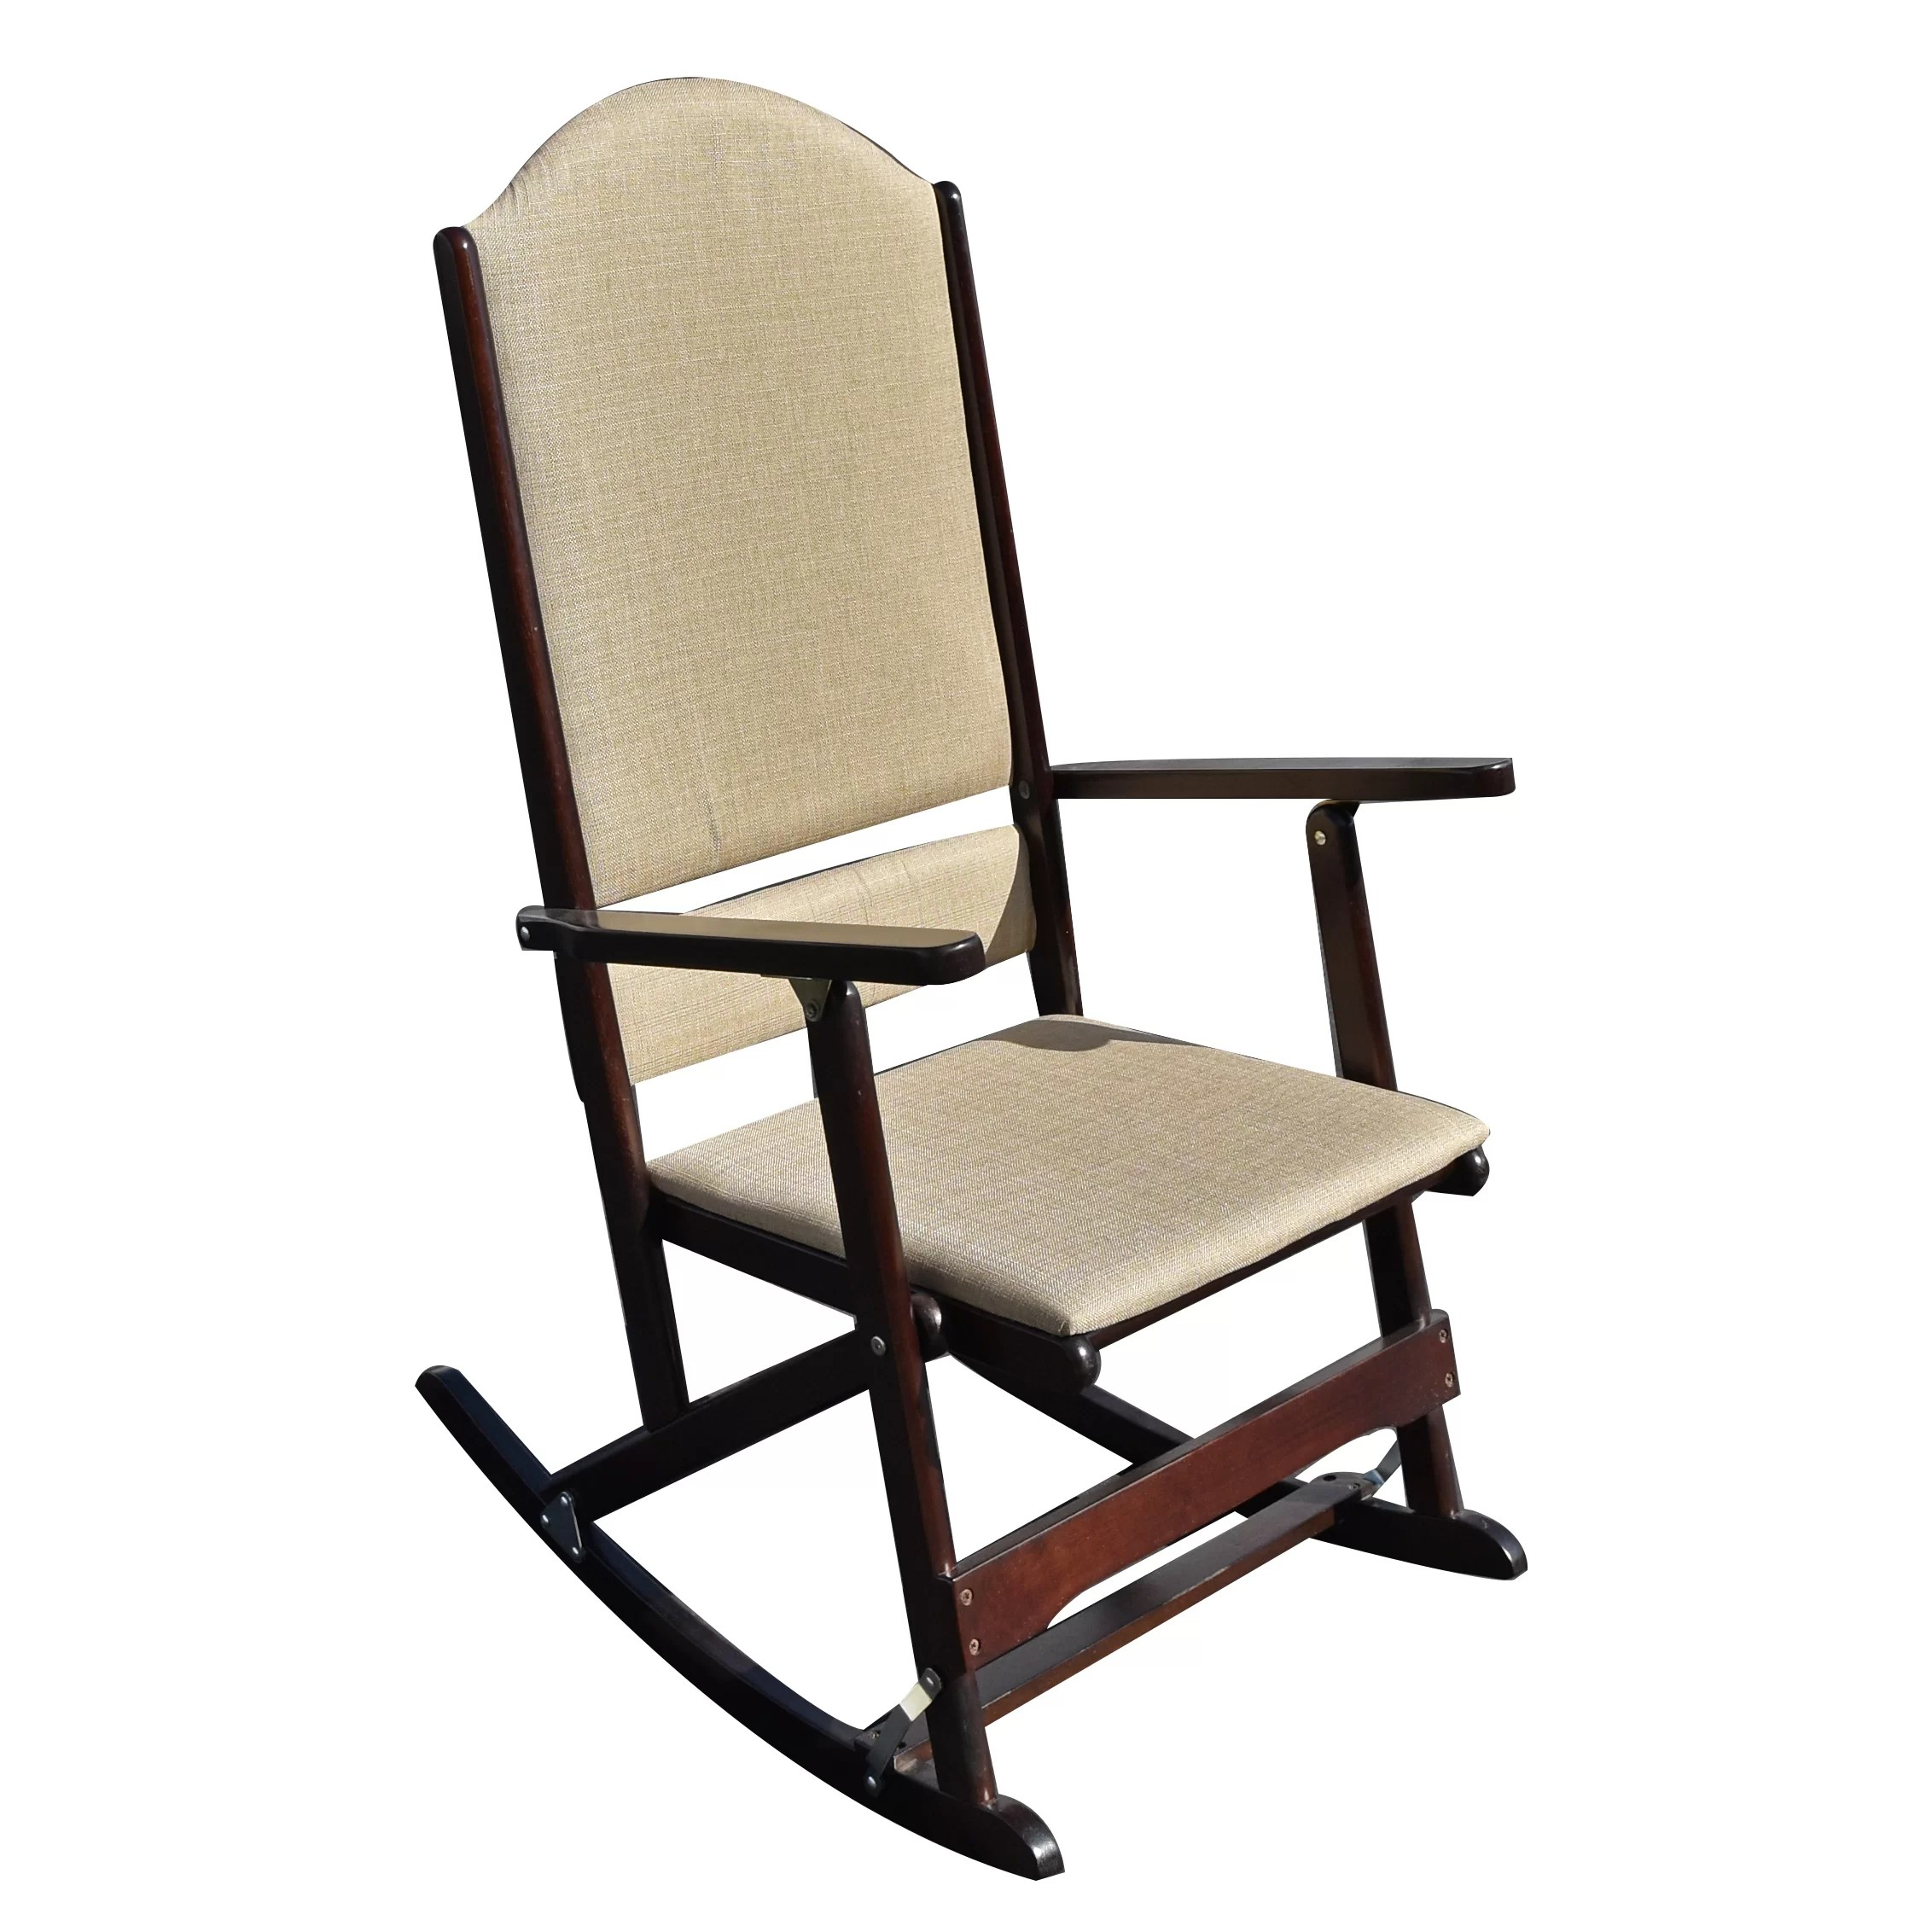 folding rocking chair wood poker chairs for sale wildon home  cedar creek solid